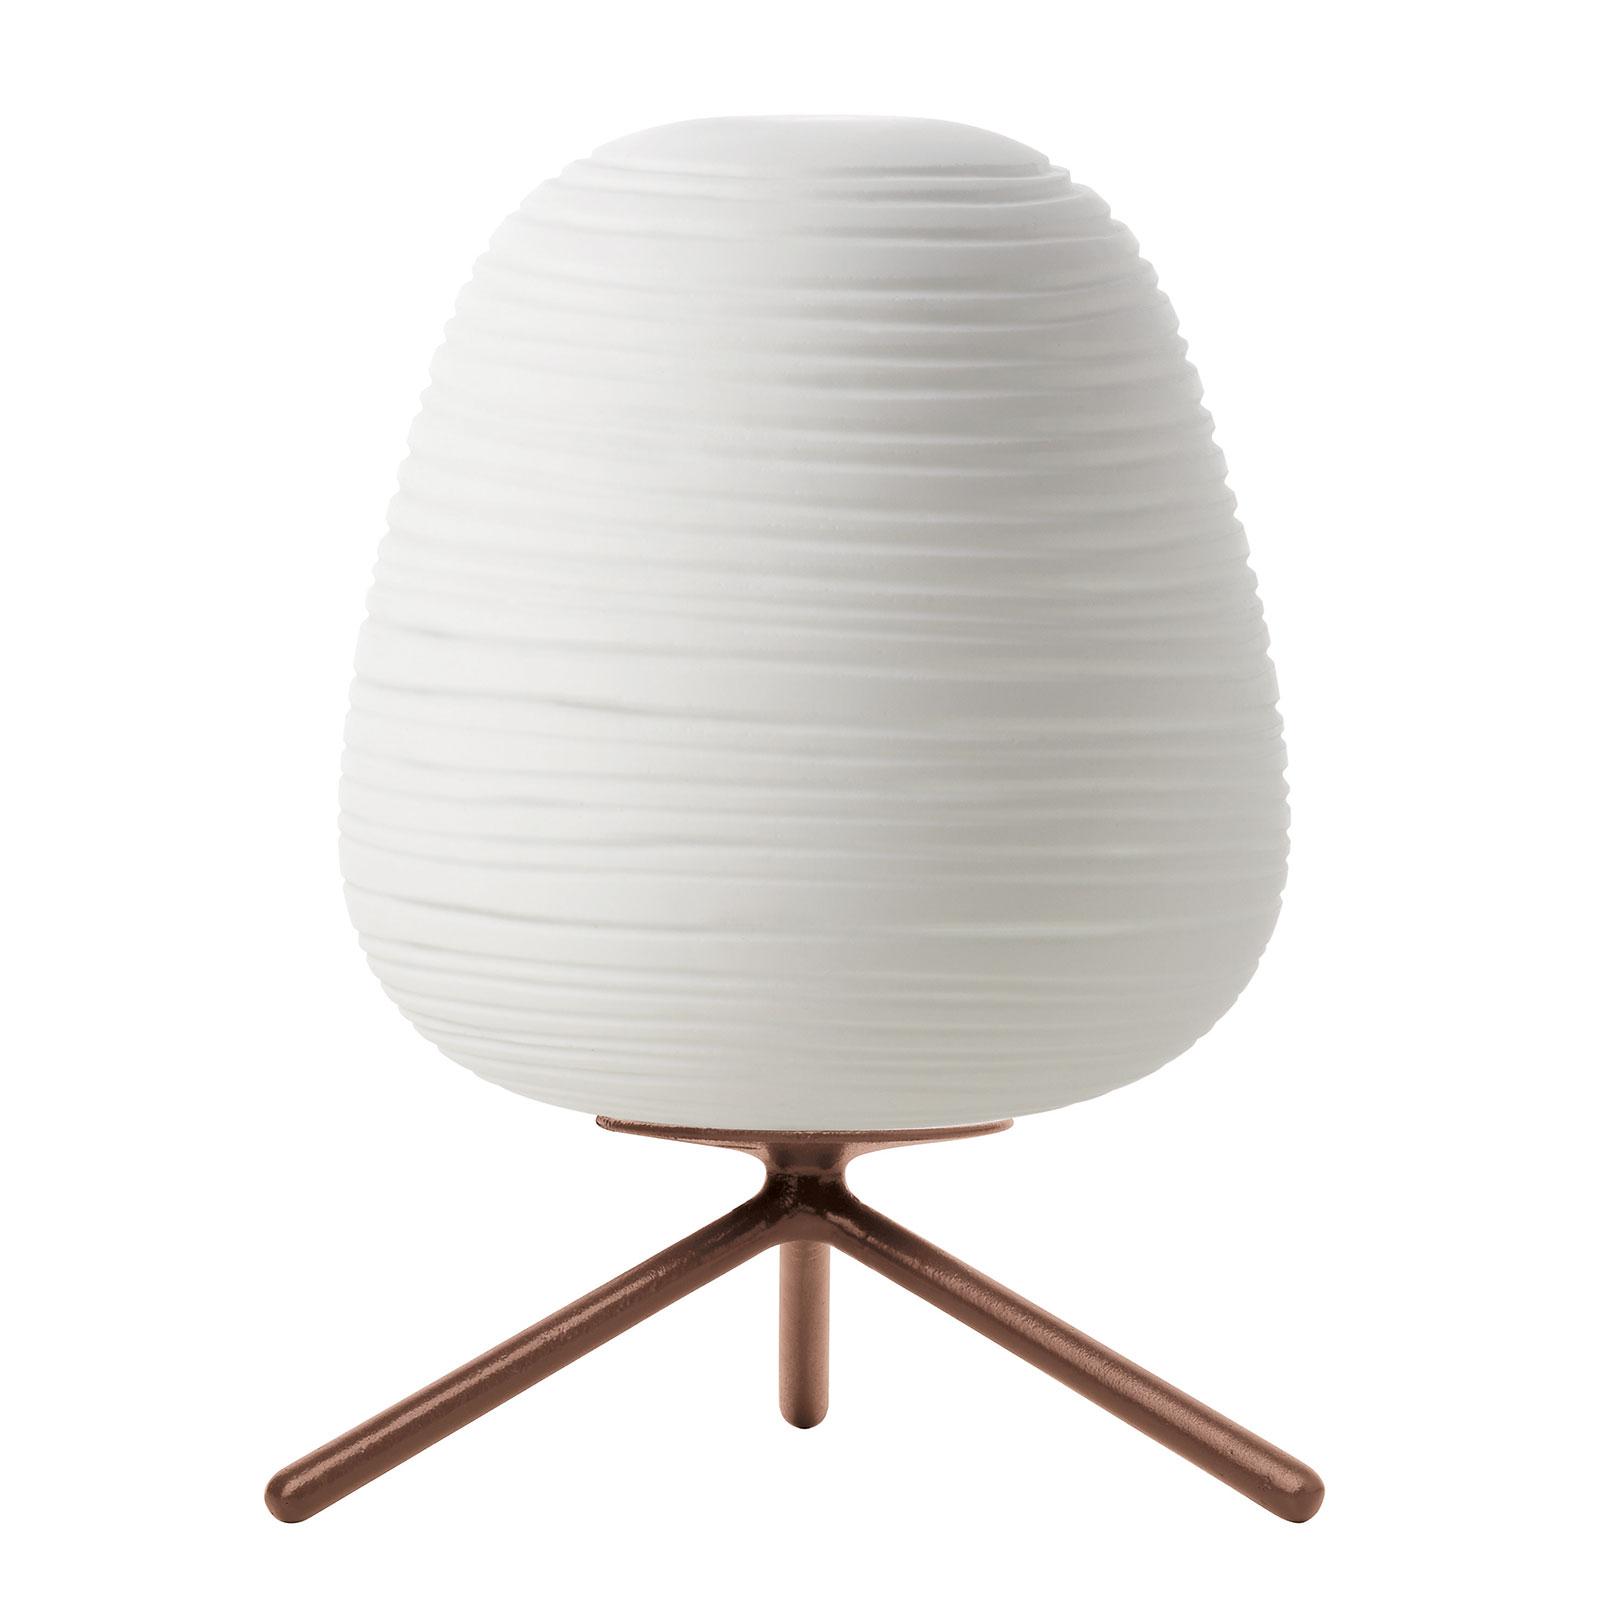 Foscarini Rituals 3 szklana lampa stołowa